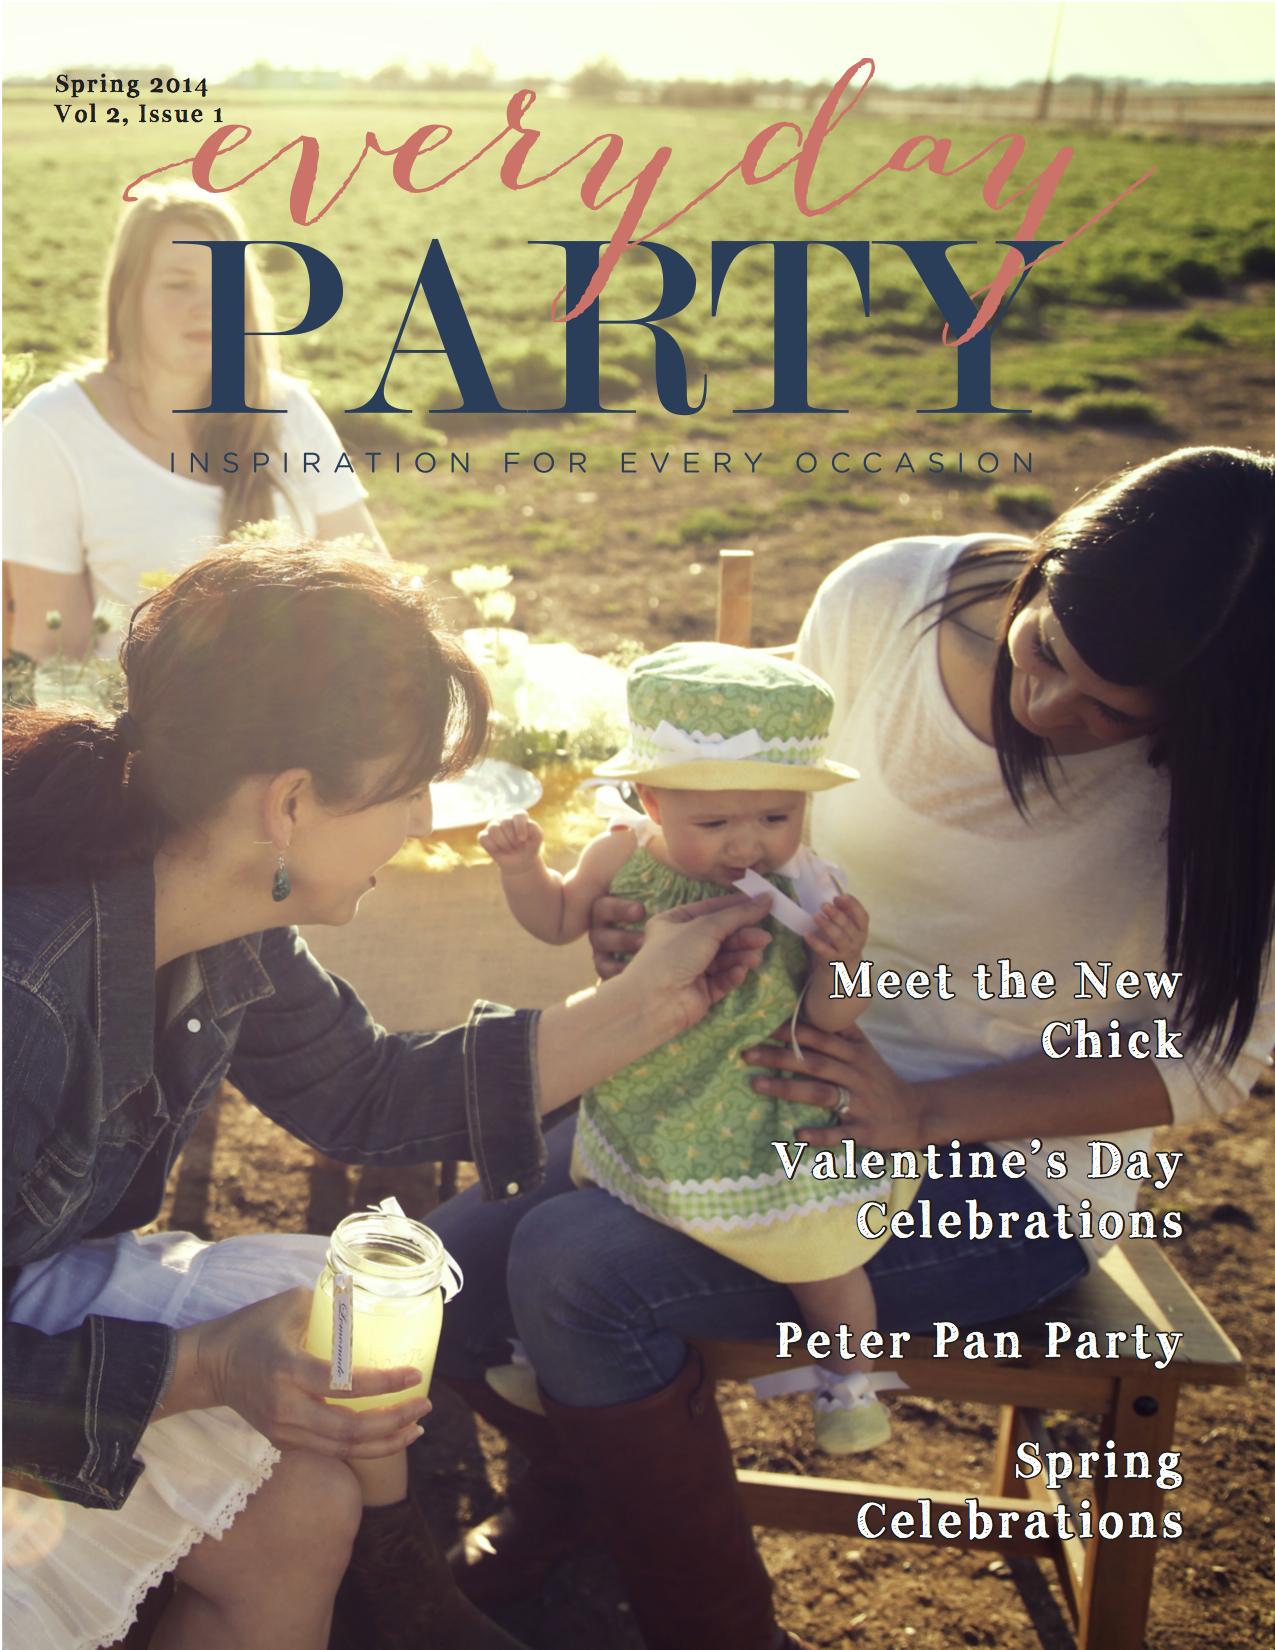 Everyday Party Magazine Volume 2 Issue 1